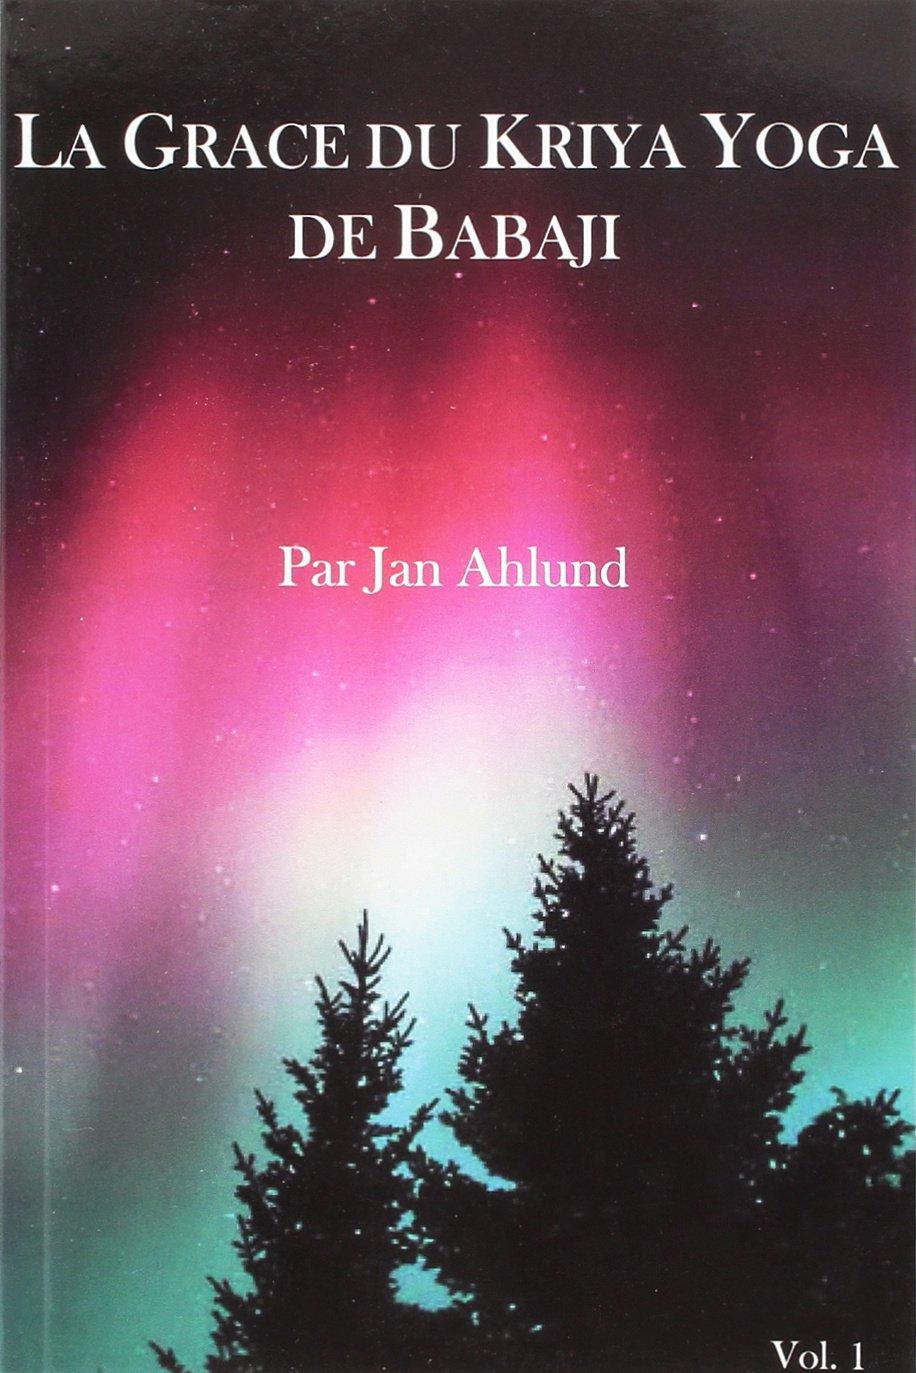 Grace du Kriya Yoga de Babaji (la): Amazon.es: Jan Ahlund ...